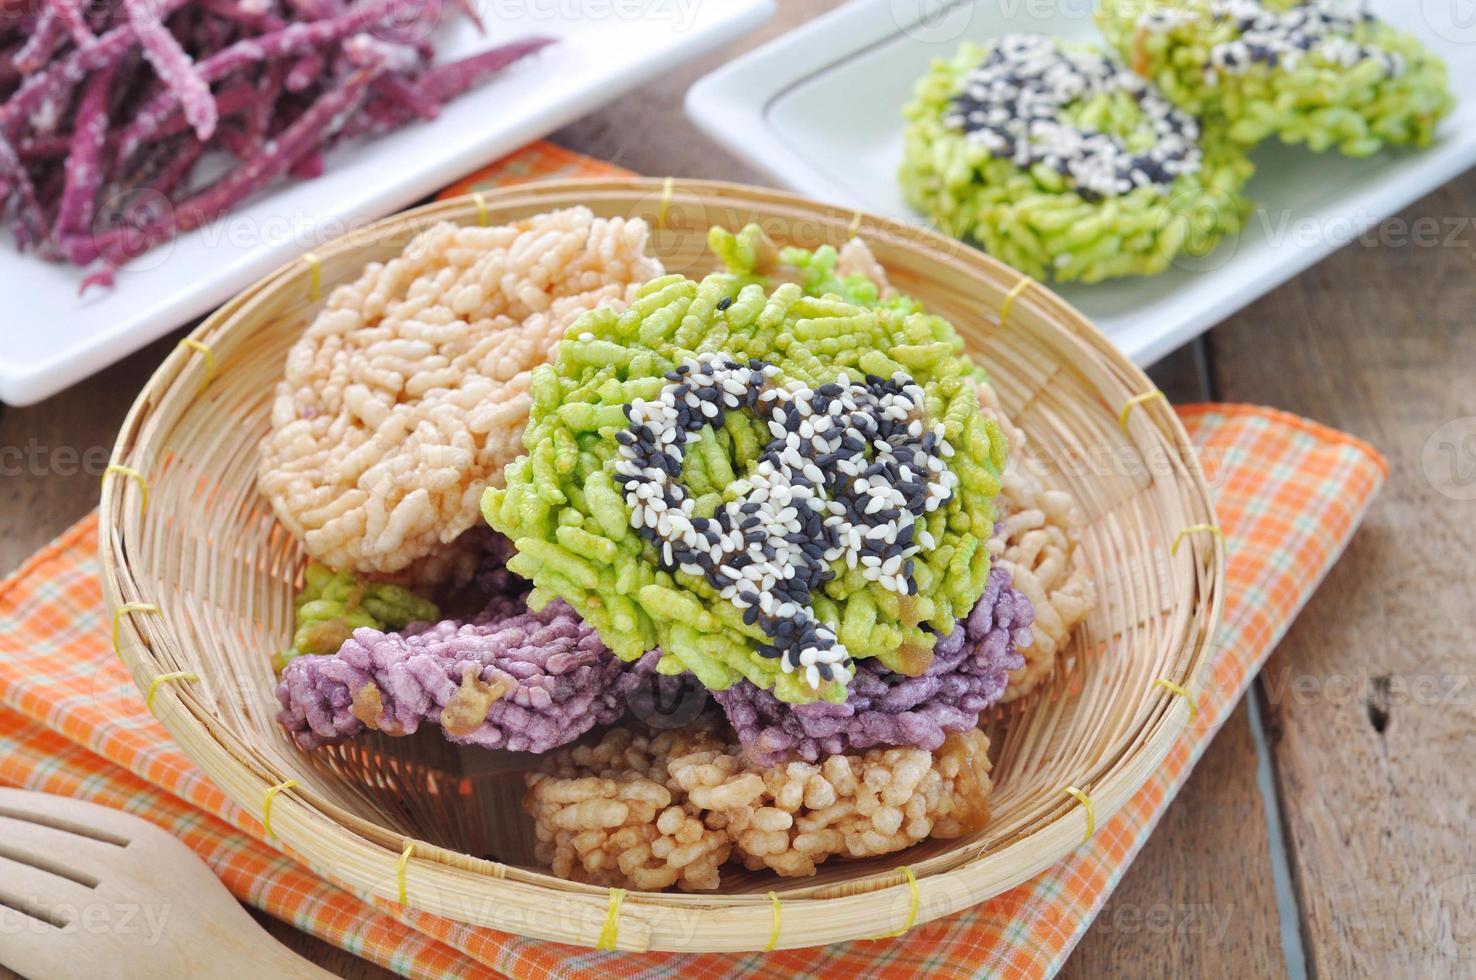 pasteles de arroz crujiente dulce tailandés con llovizna de azúcar de caña. foto